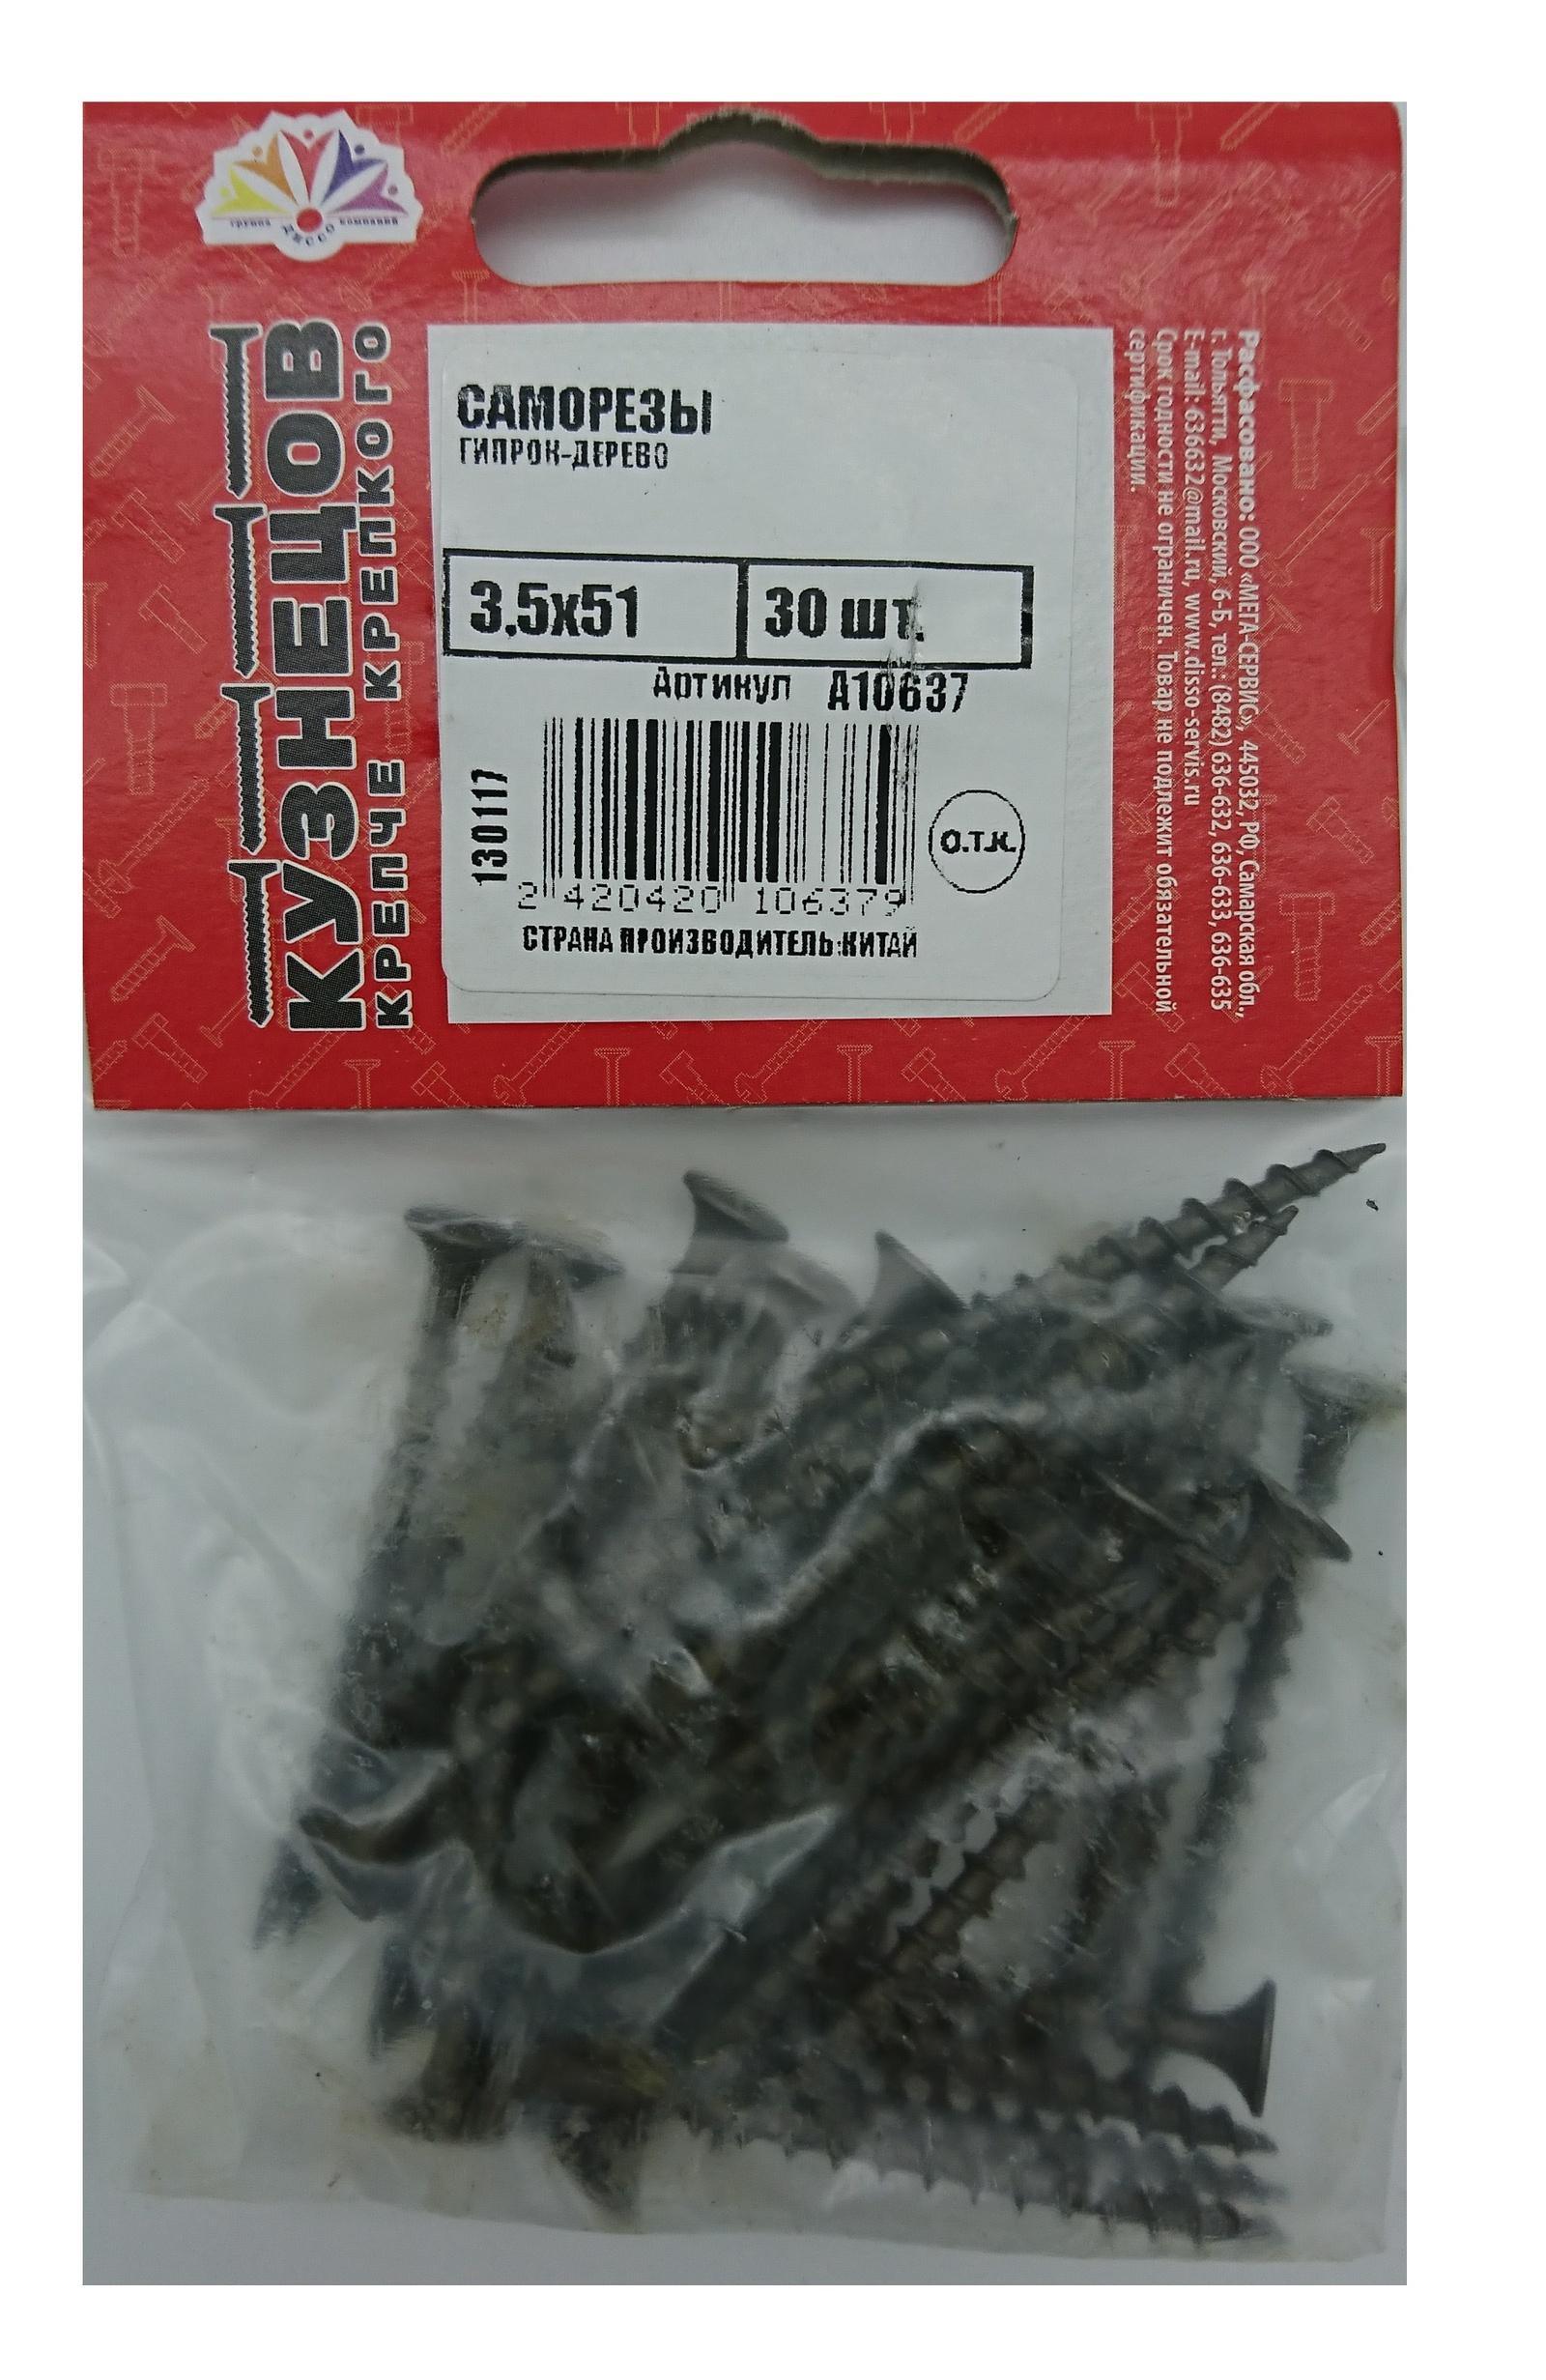 Саморез Кузнецов гипсокартон-дерево 3,5х51 (30 шт. в упаковке) цена и фото